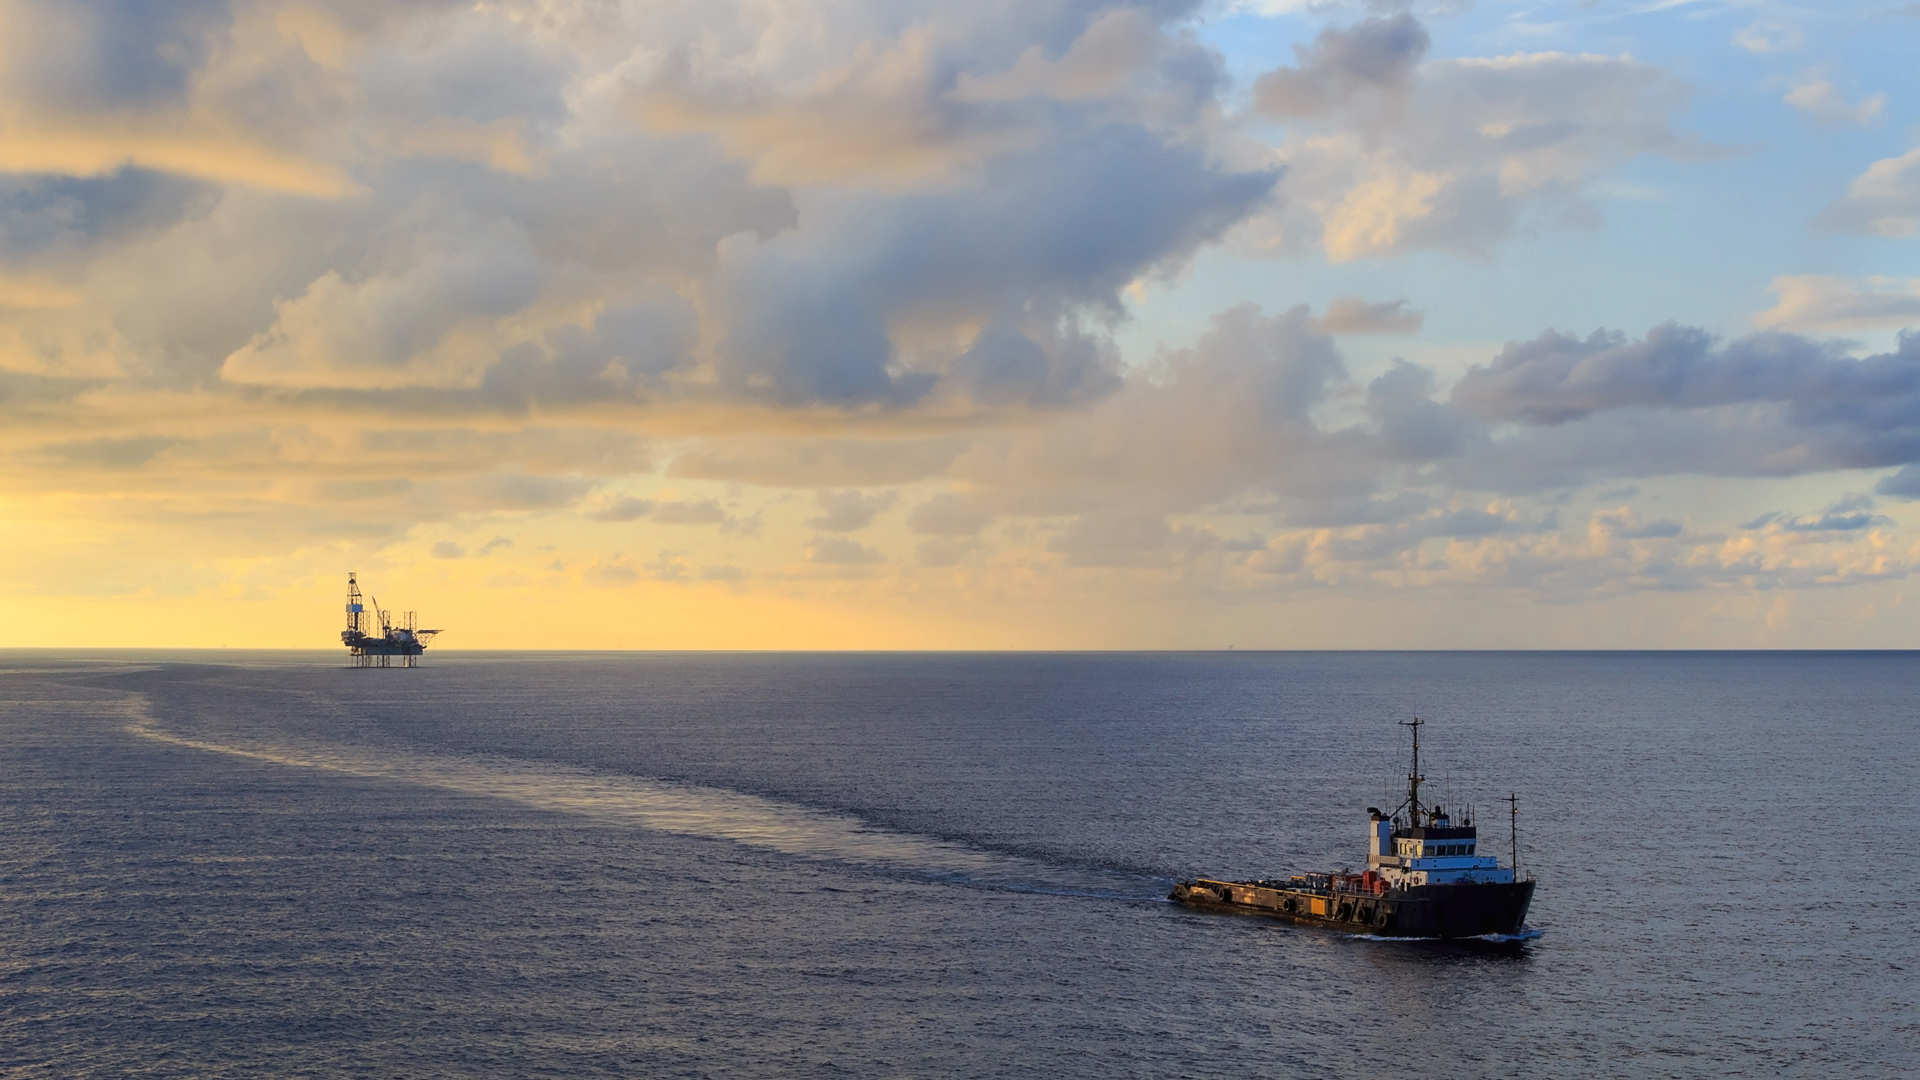 Ship Decks and Inboard Marine